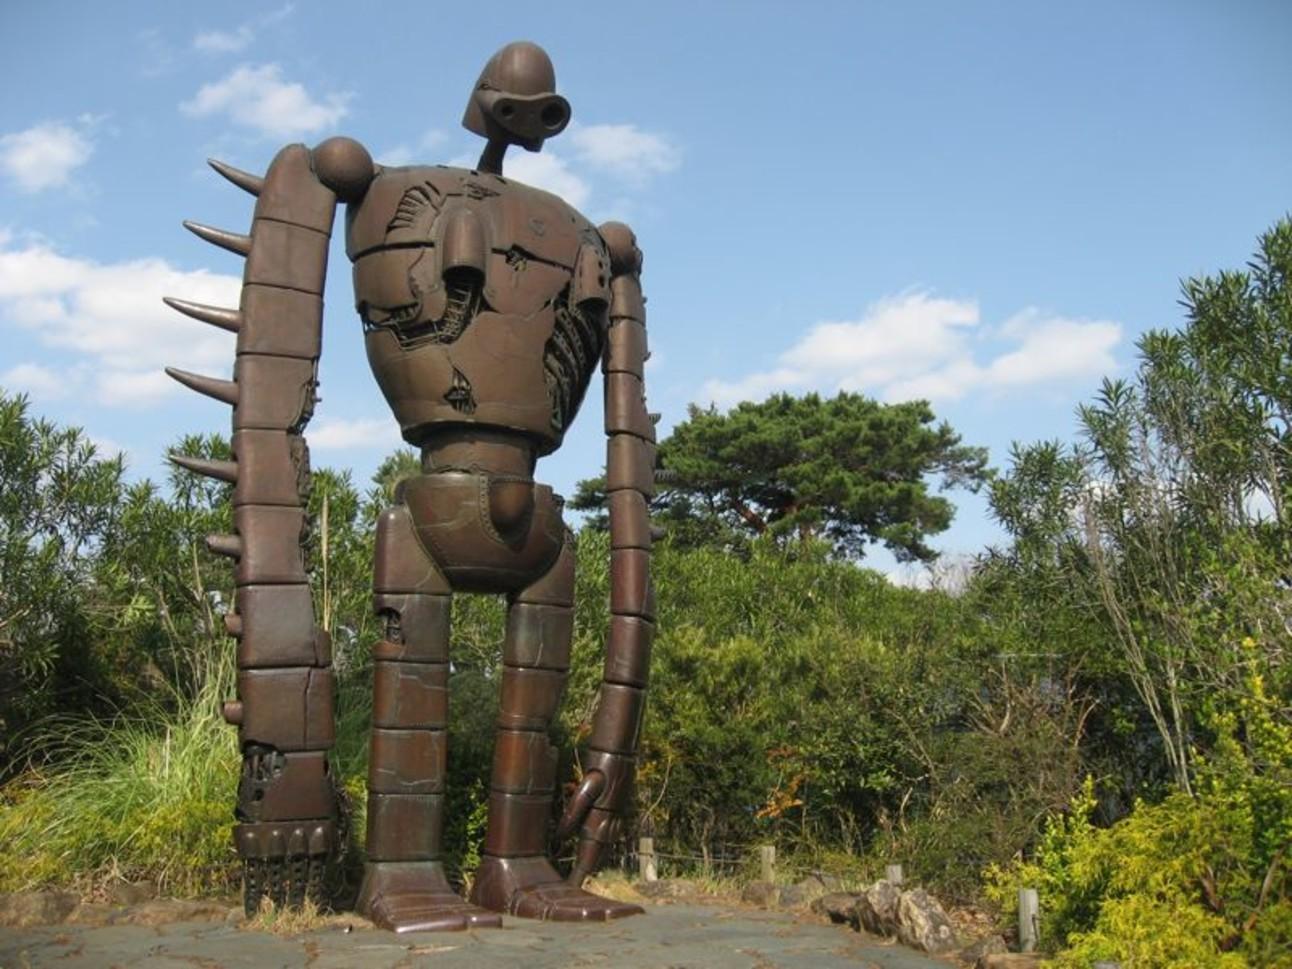 ghibli-museum-robot.jpg